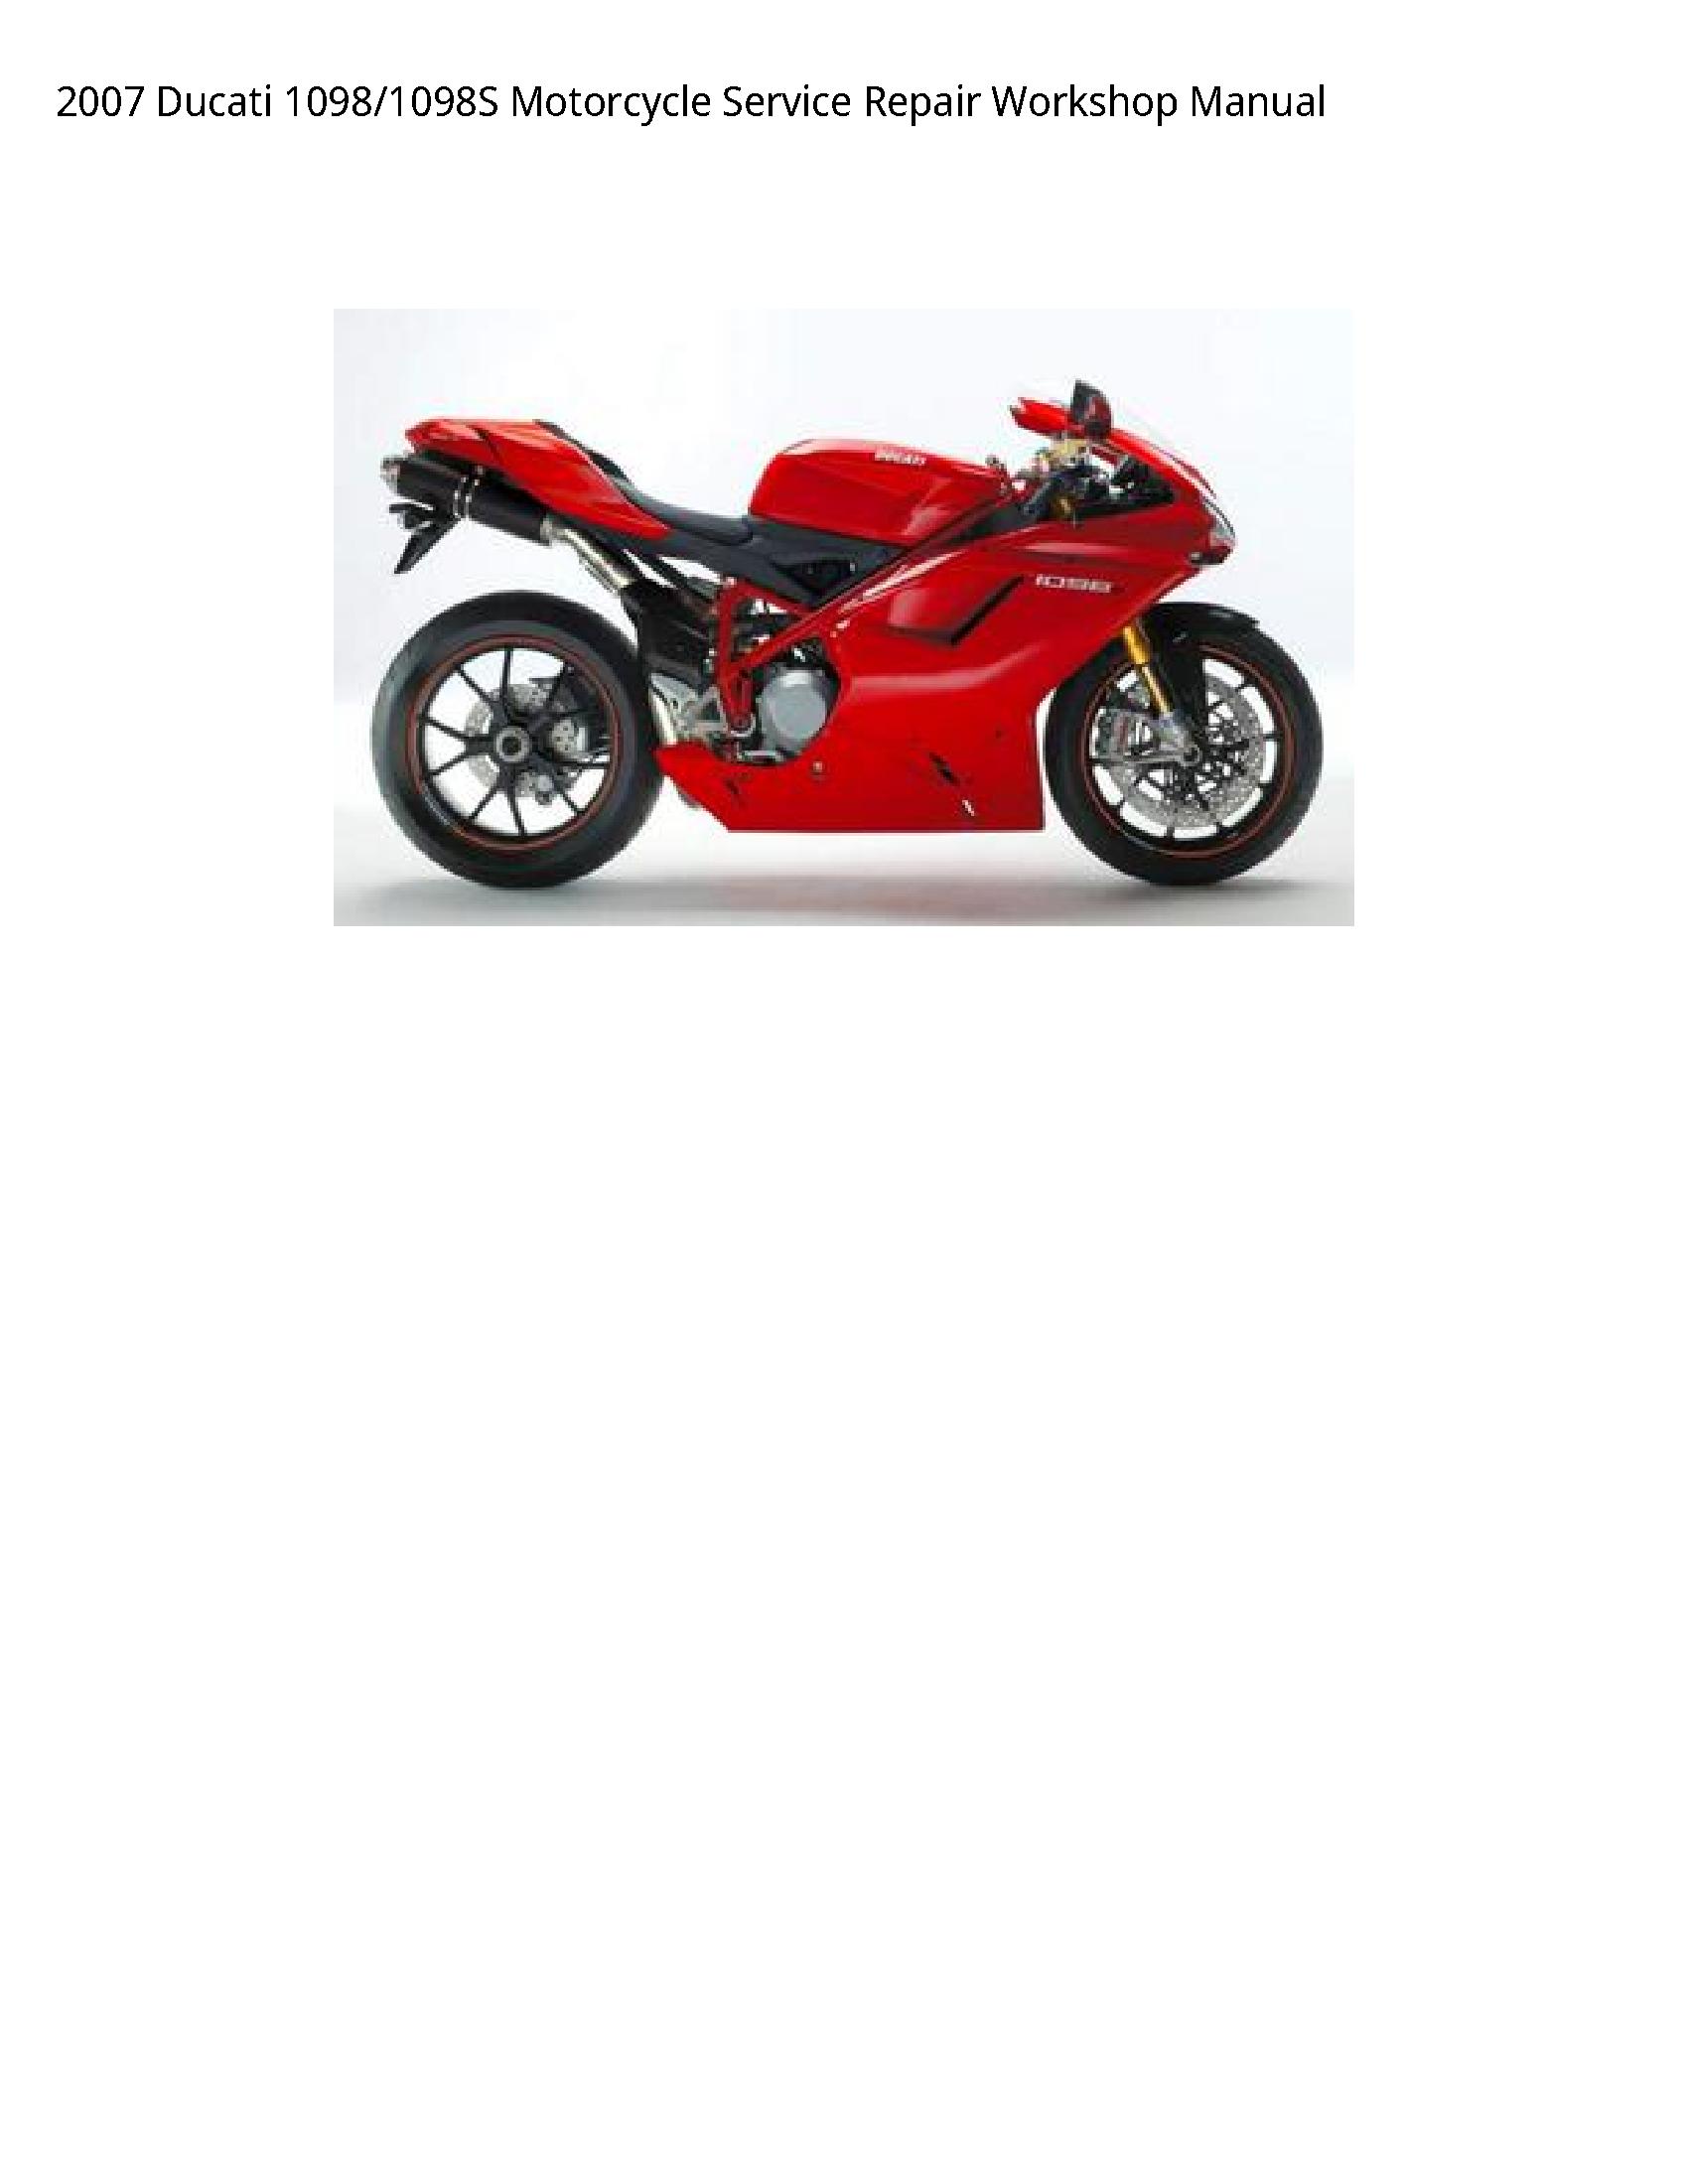 Ducati 1098 Motorcycle manual